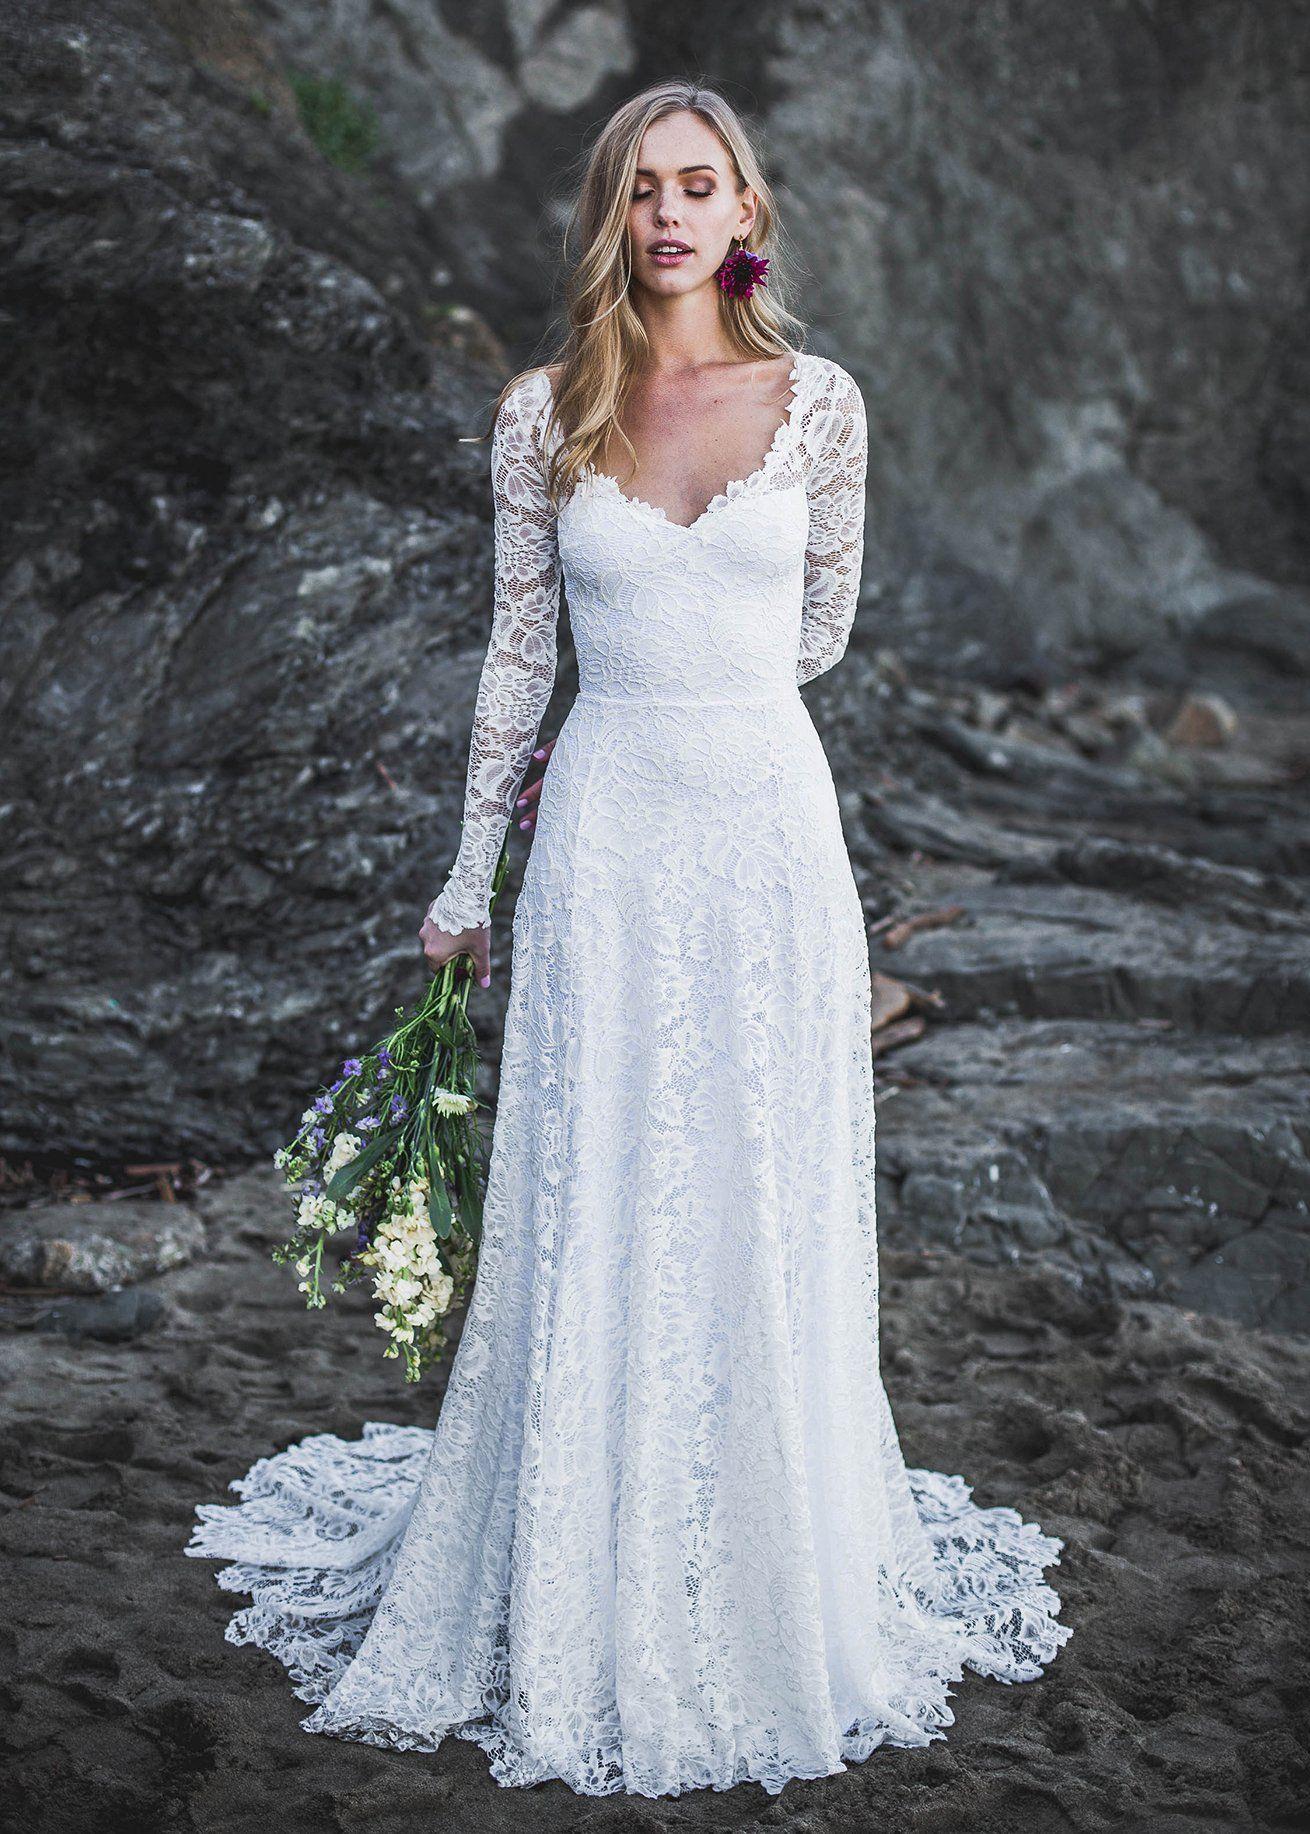 Indigo Dress Wedding Dresses Wedding Dress Sleeves Sweetheart